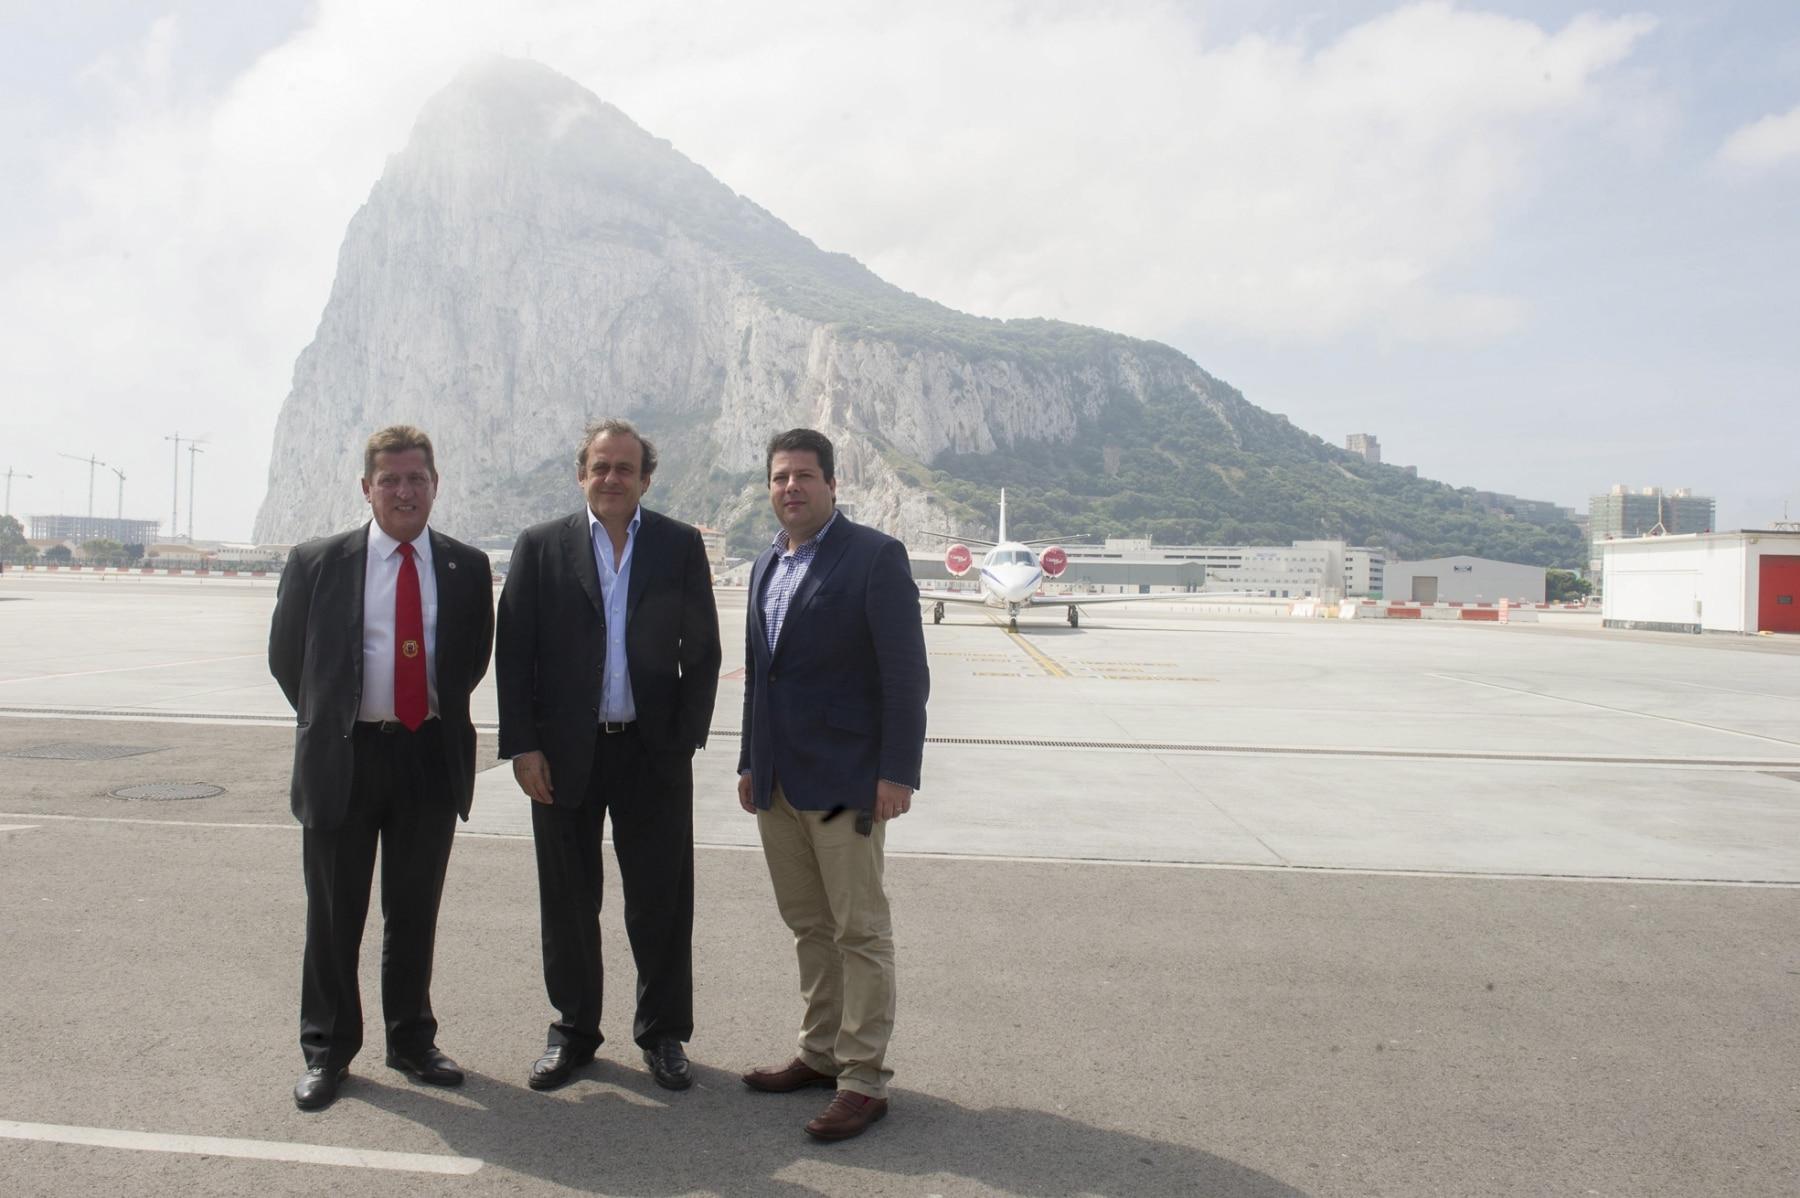 visita-platini-gibraltar-rock-cup-2014-01_14153904724_o